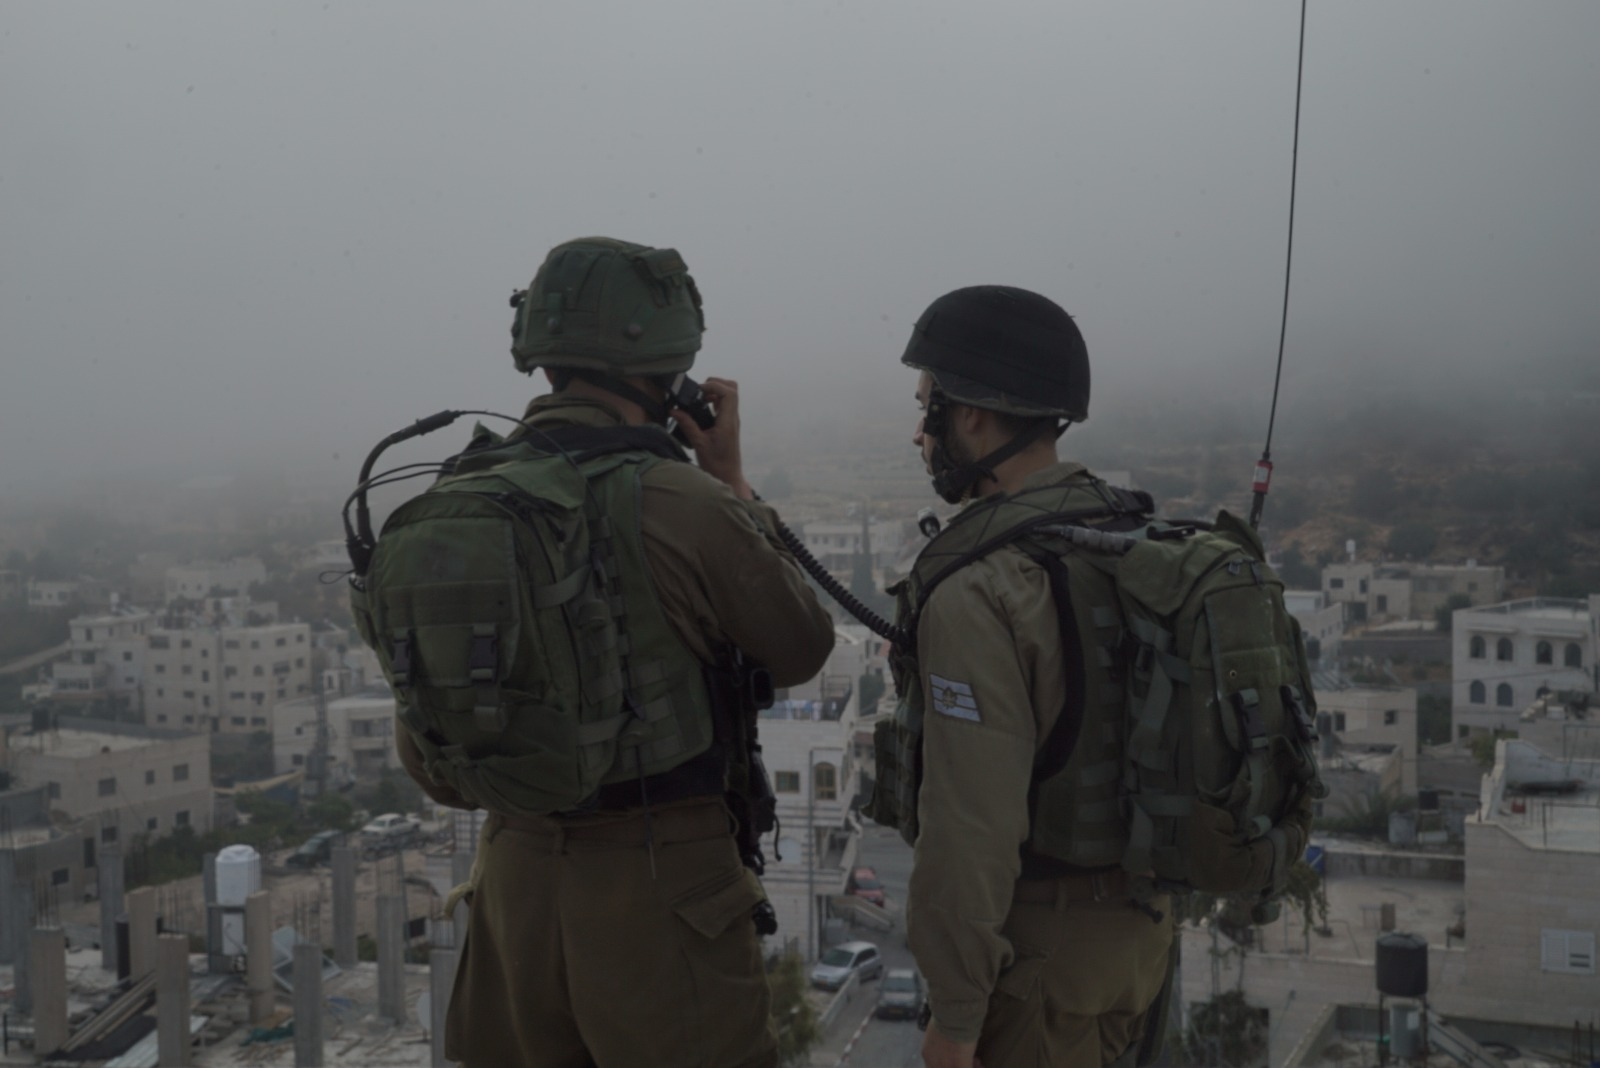 Israeli army pen pals